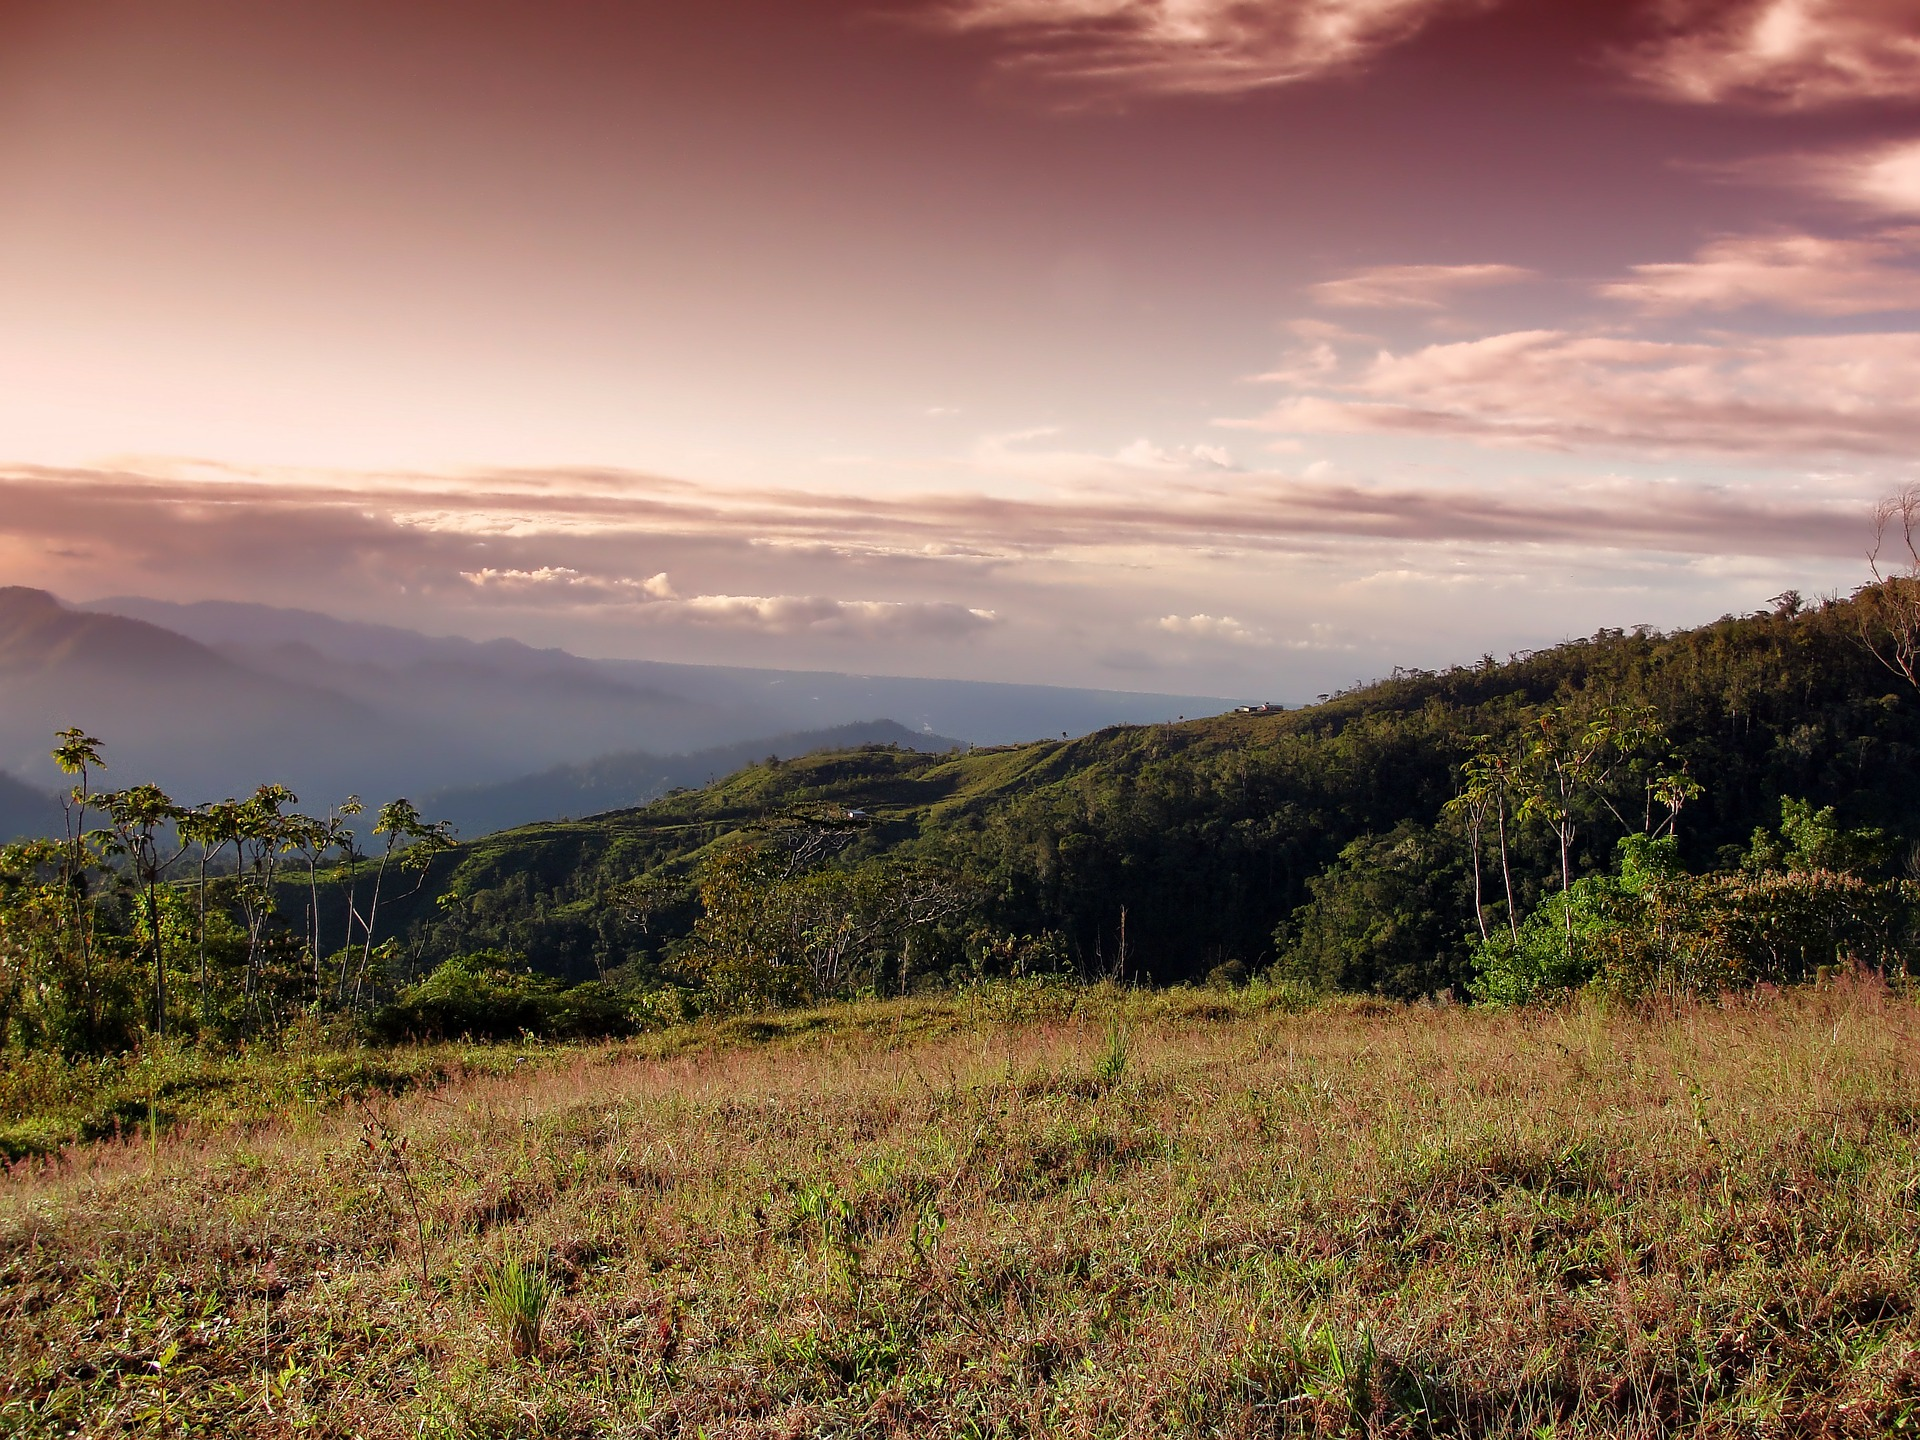 Nádherná příroda Kostariky